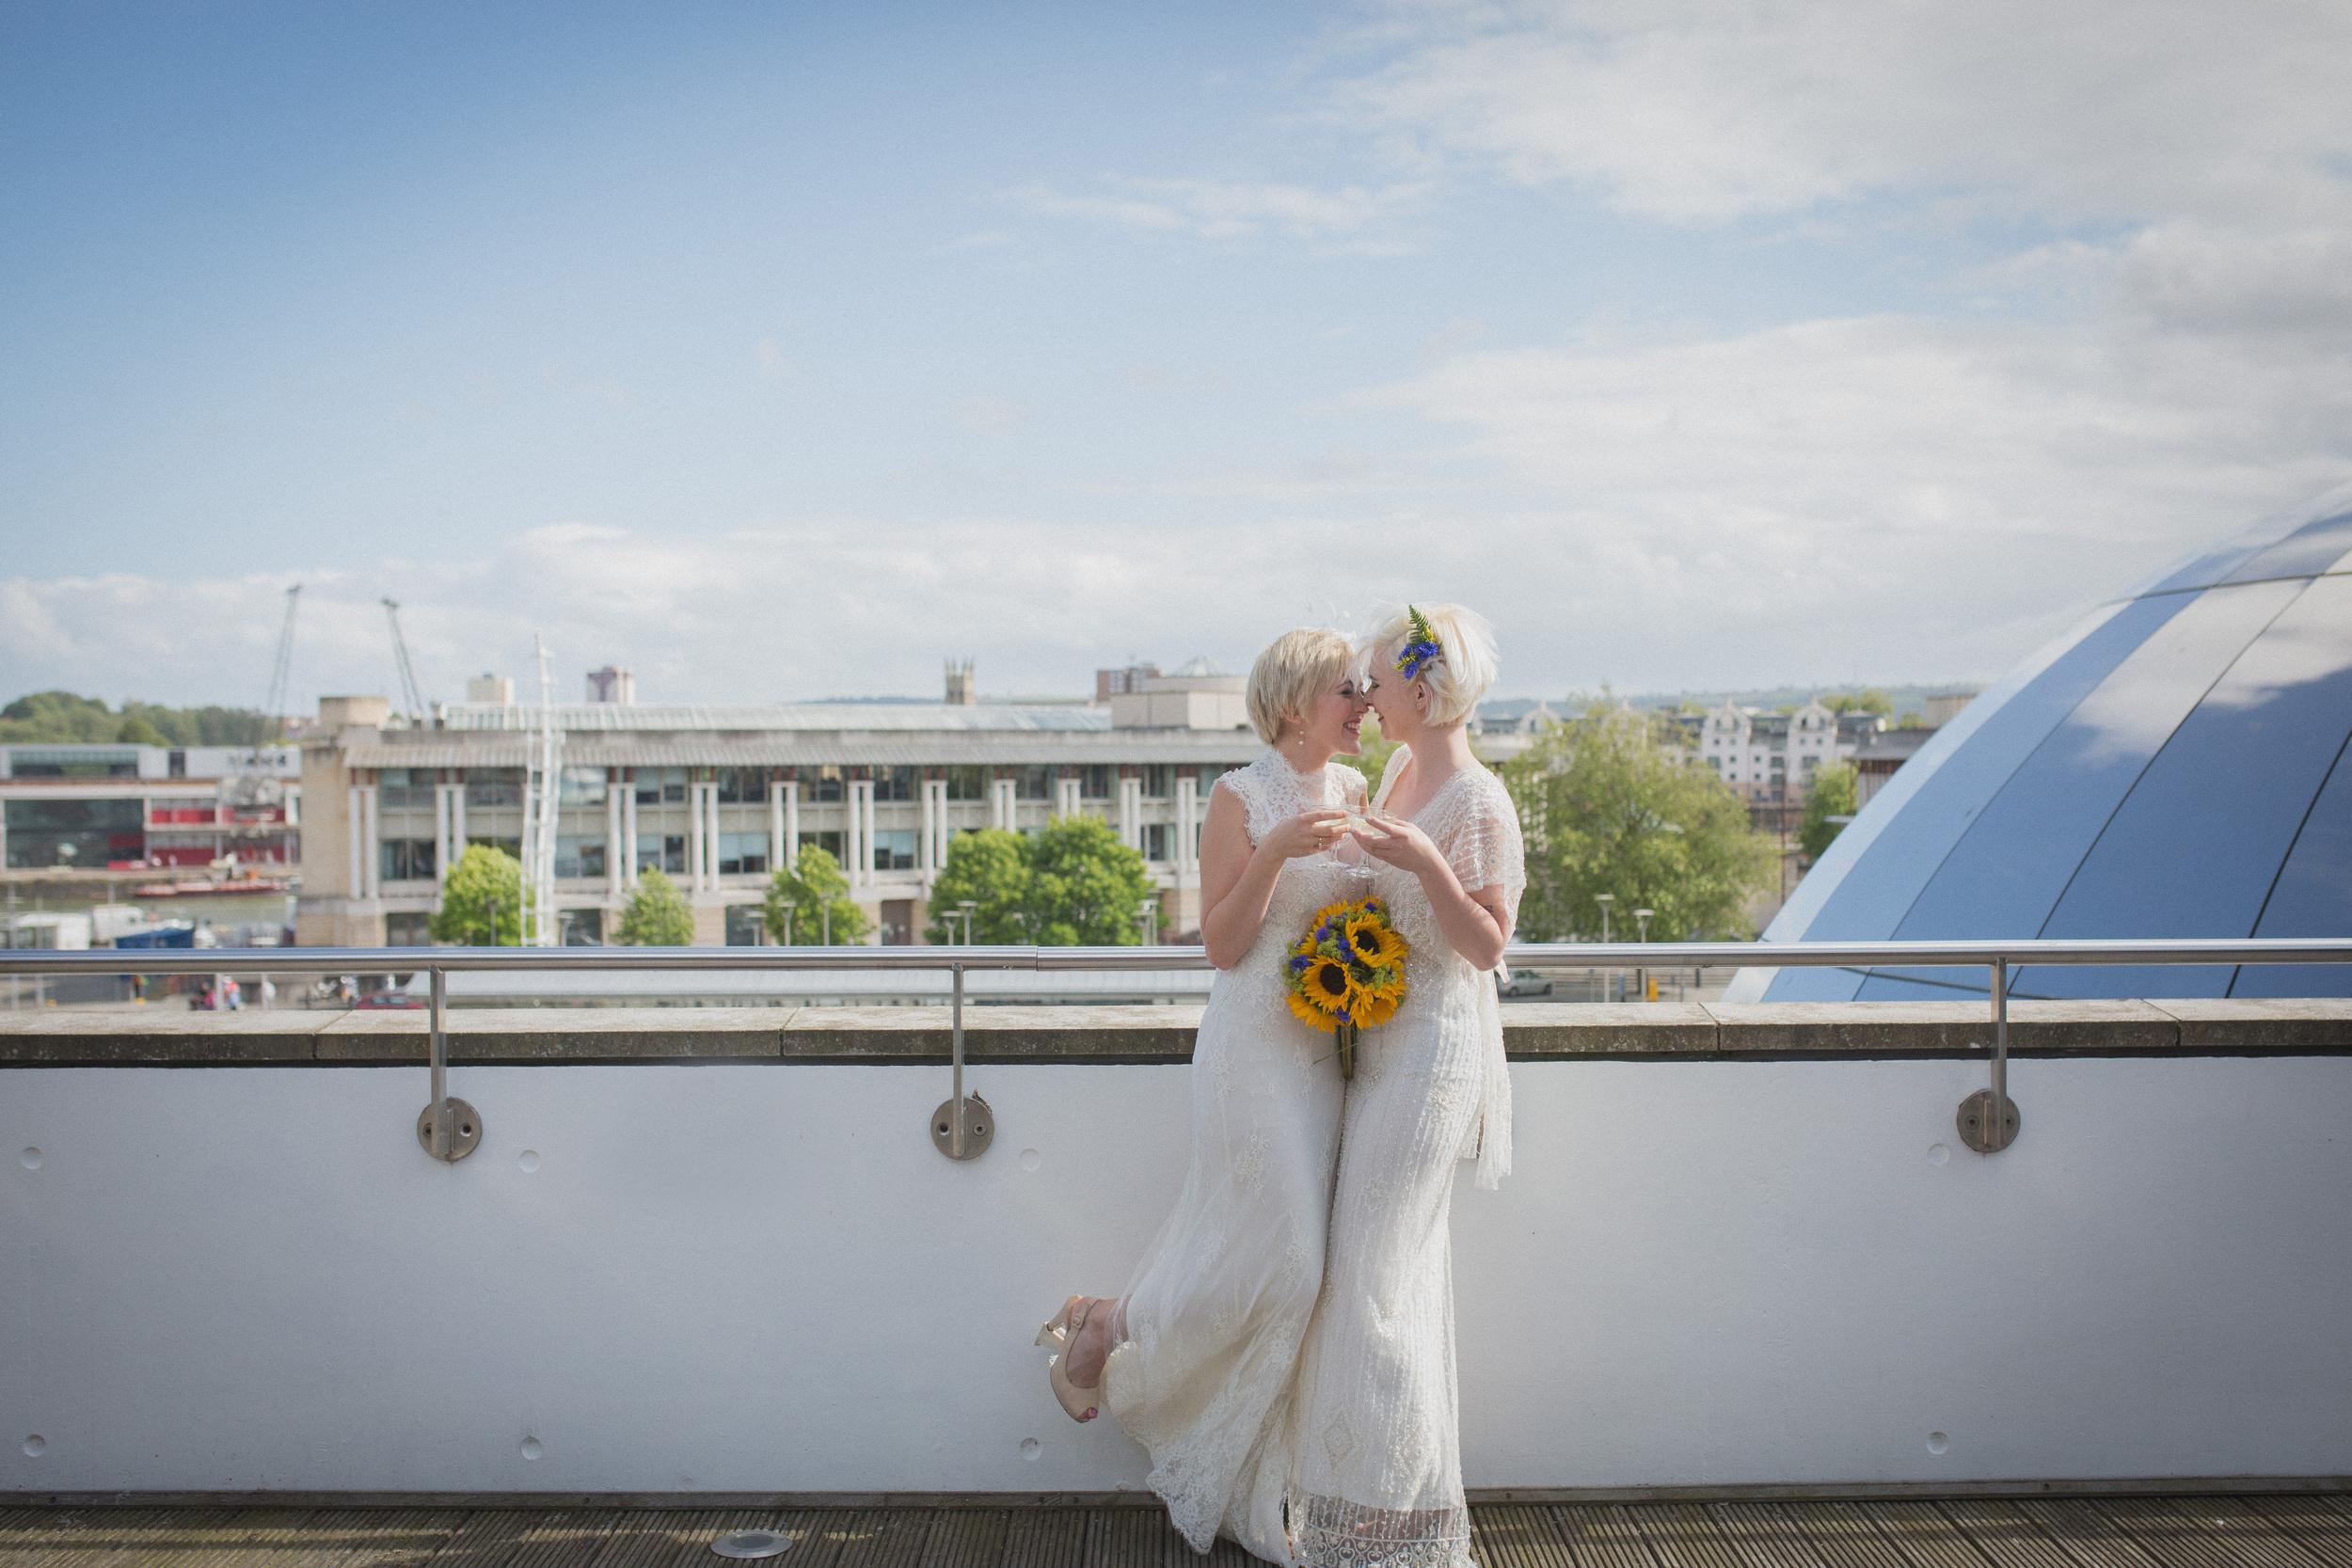 At-Bristol-Planetarium-Wedding-Shoot-59.jpg